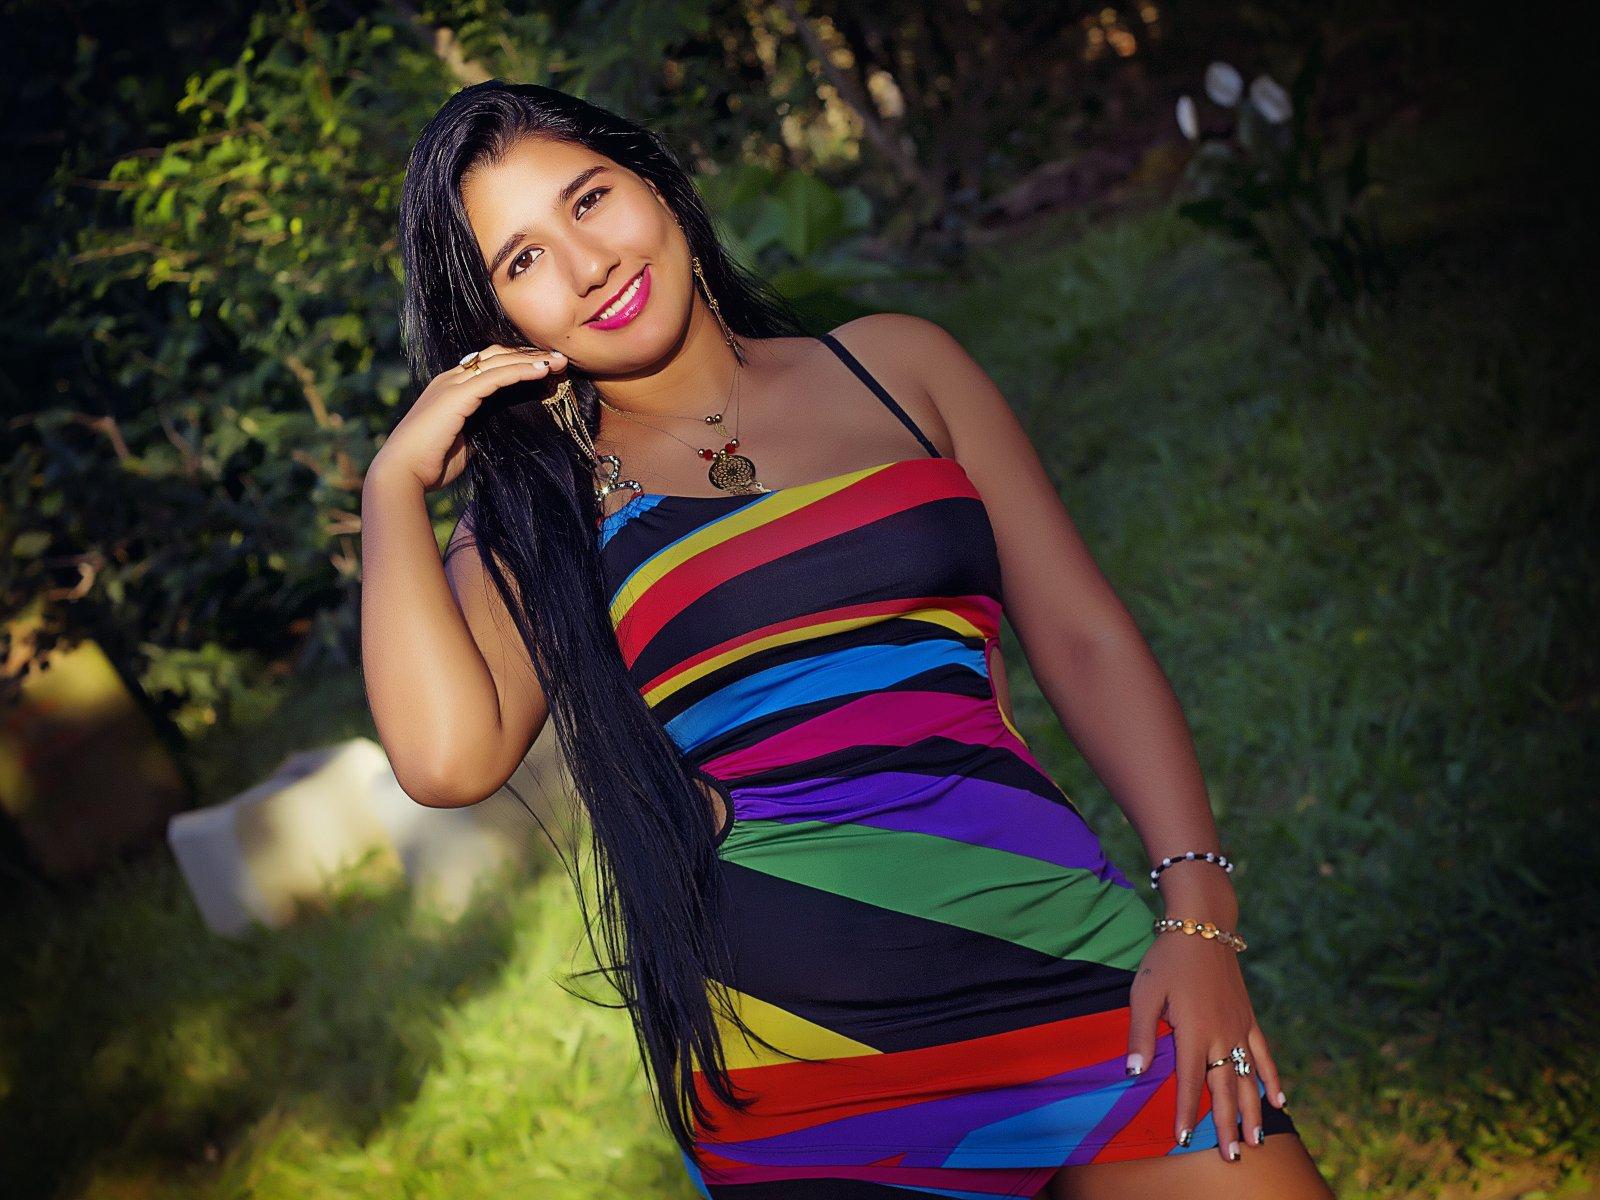 Latin Girls Dating Michigan Streetshirts Helpdesk